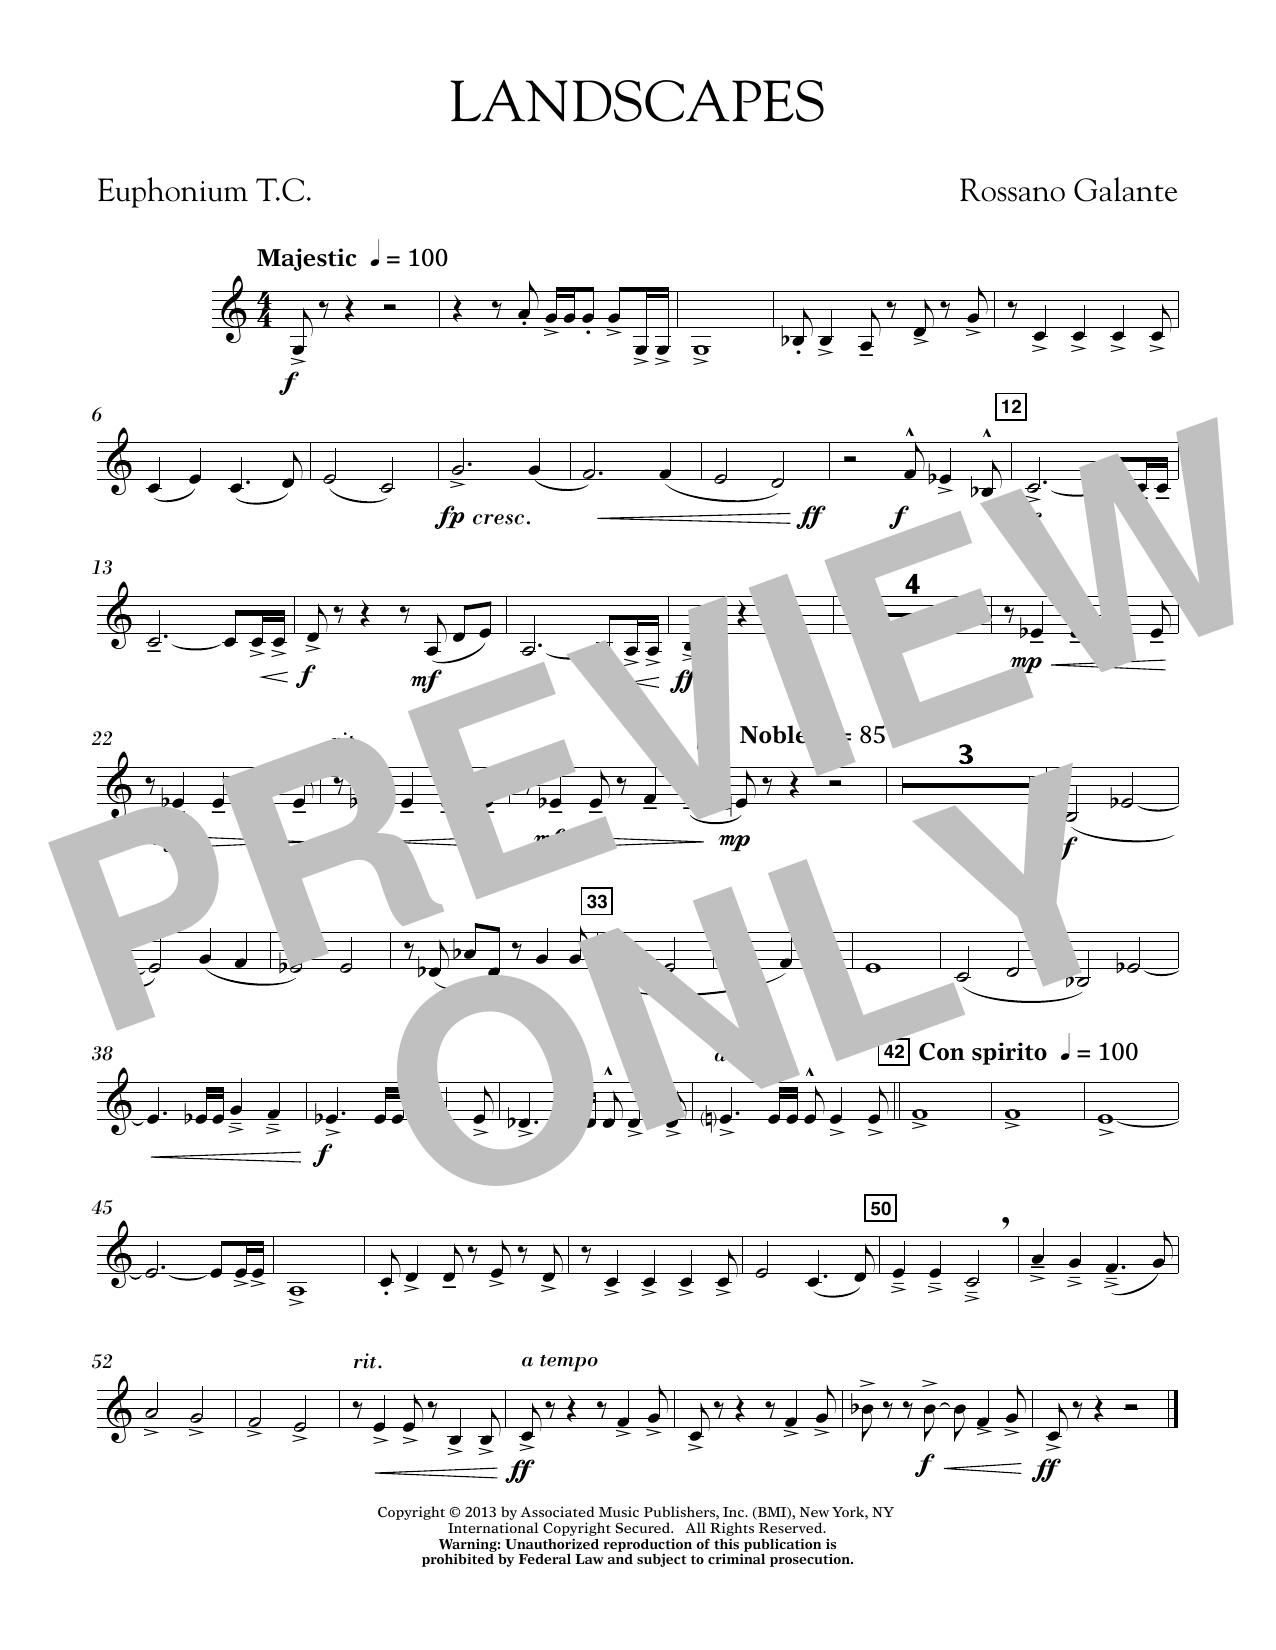 Rosanno Galante Landscapes - Euphonium in Treble Clef sheet music notes printable PDF score